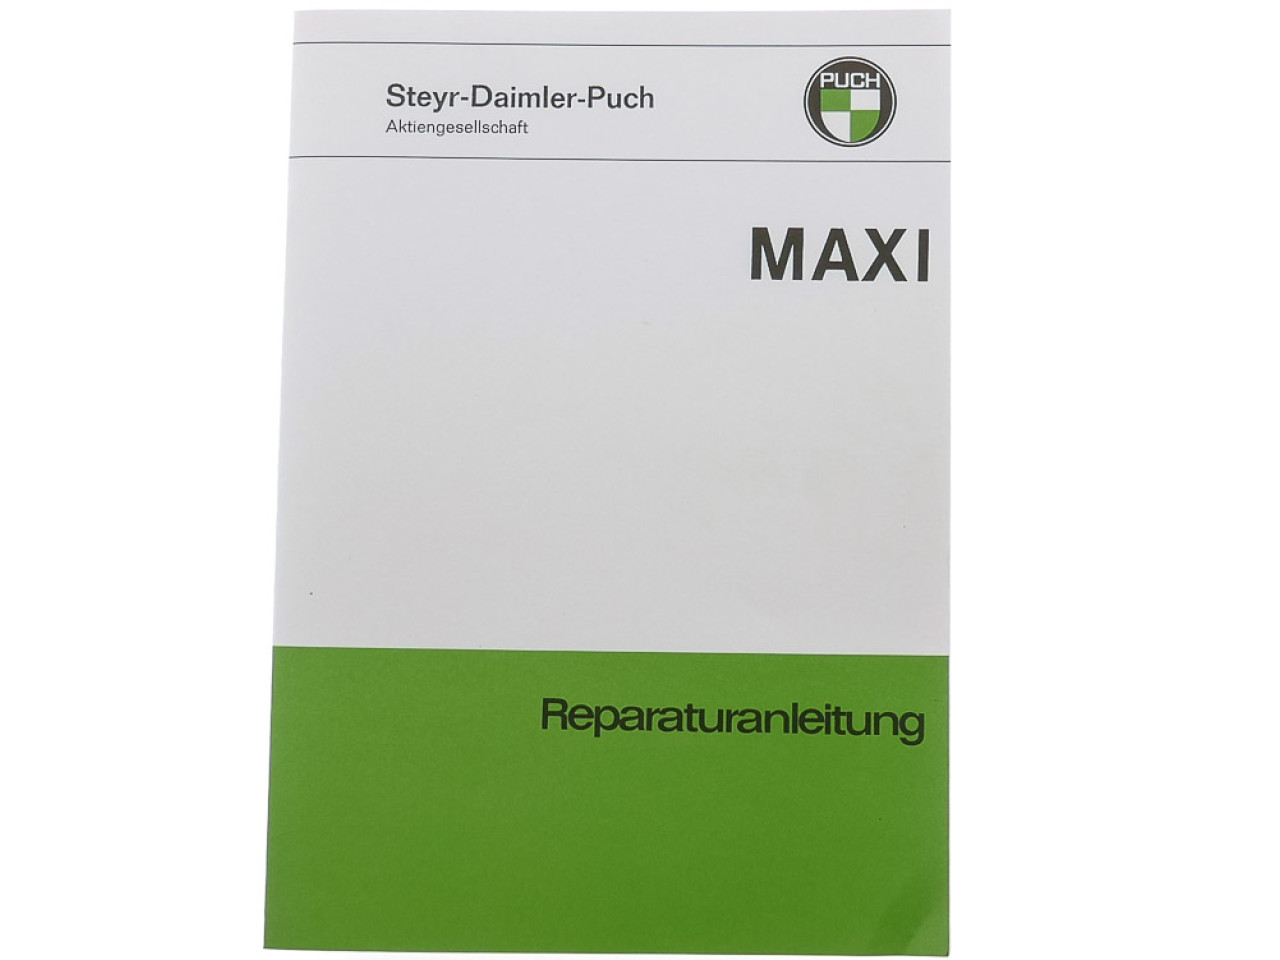 PUCH MAXI REPARATURANLEITUNG EBOOK DOWNLOAD